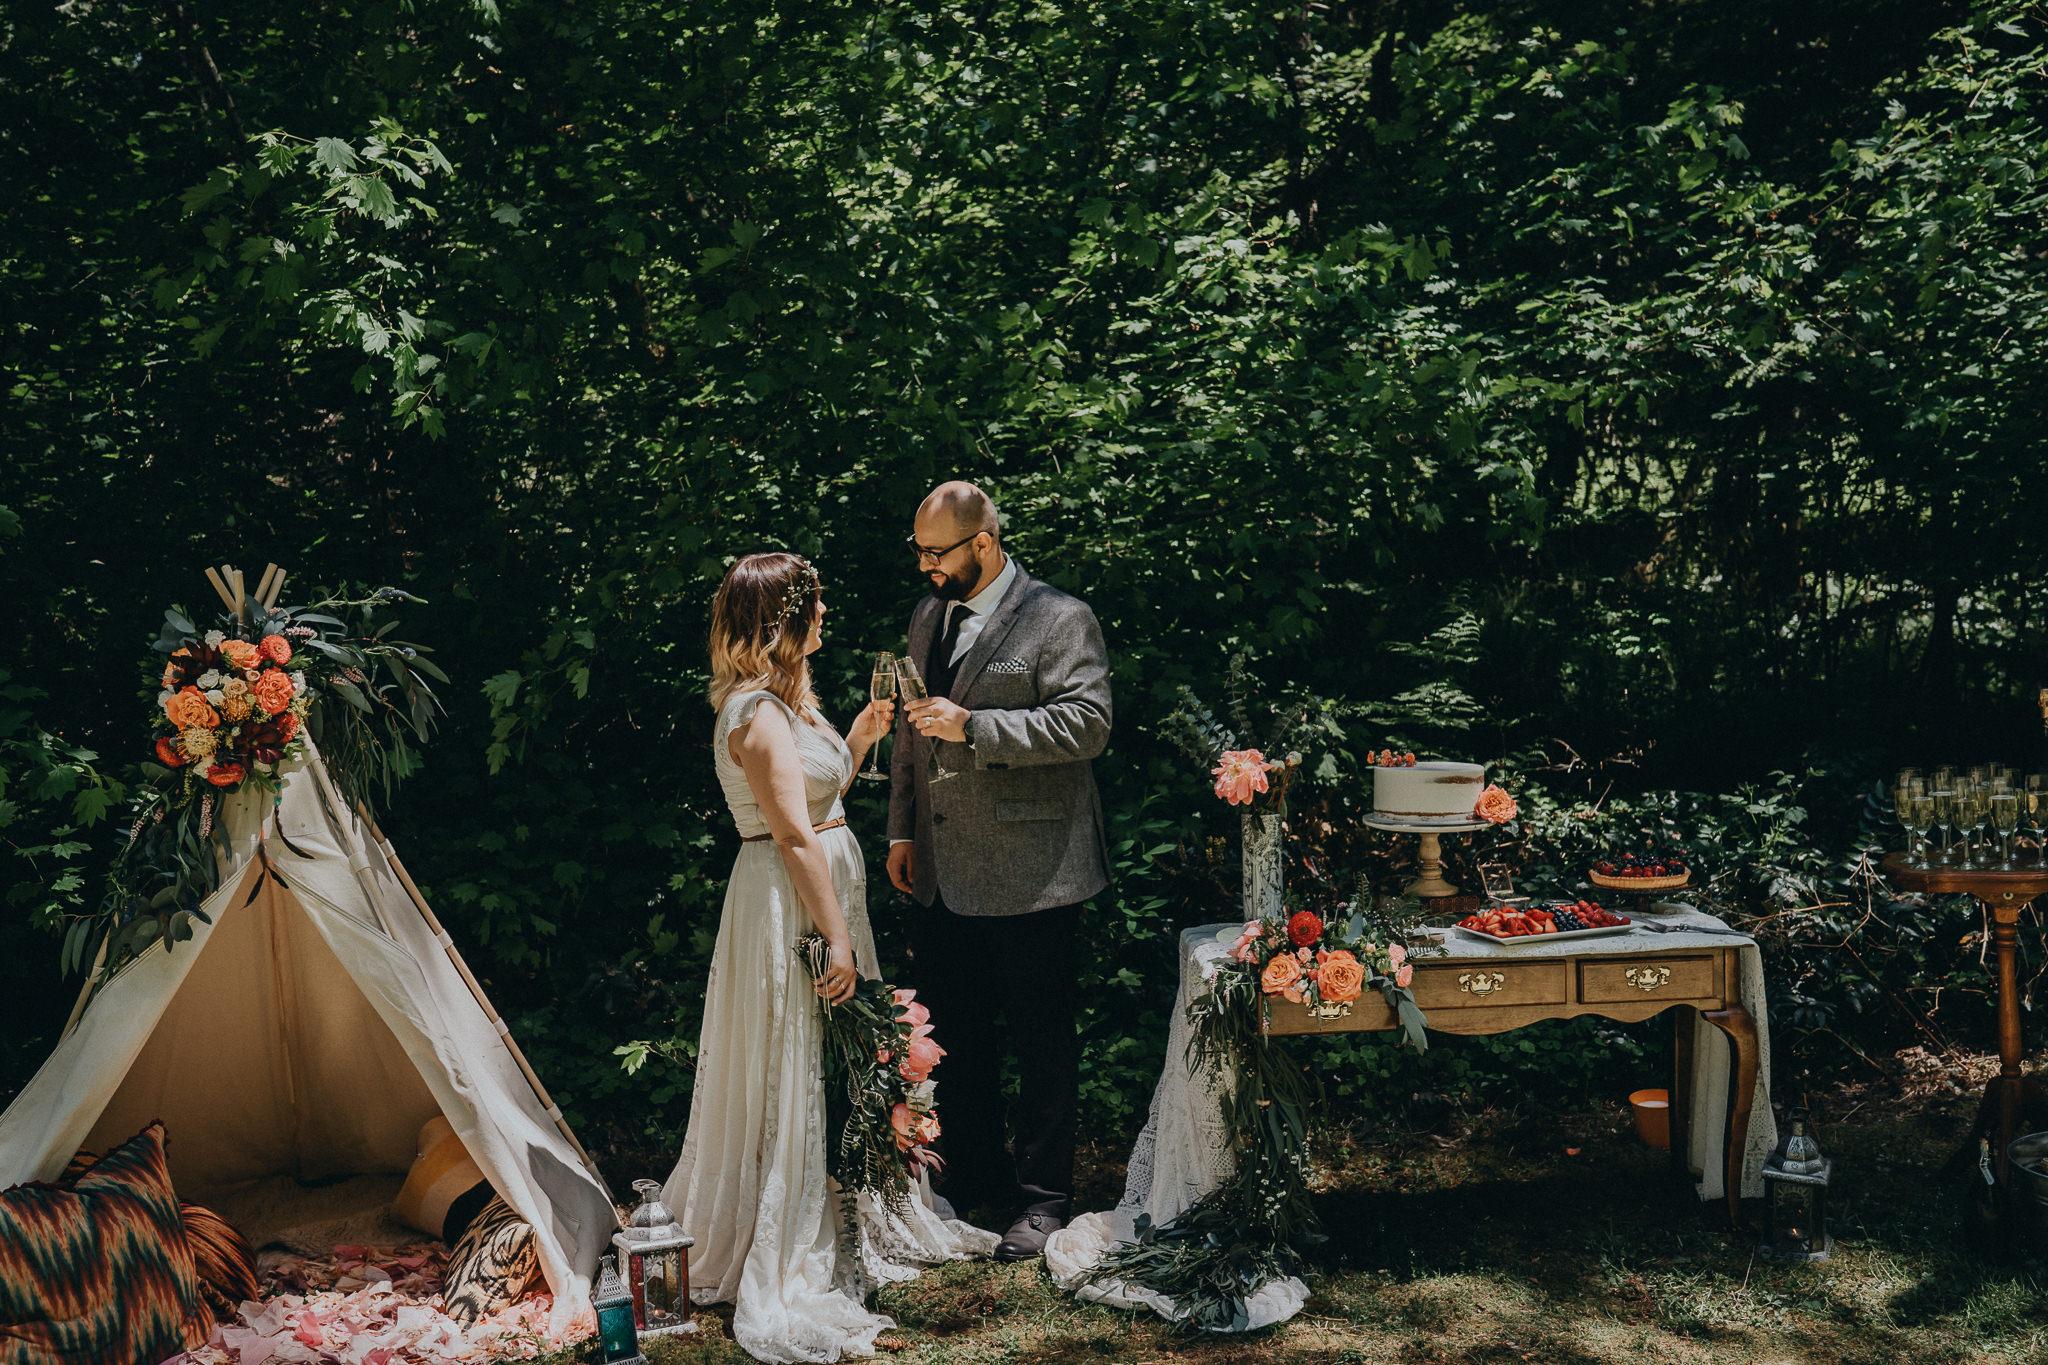 Bride-Groom-Cheer-Champagne-Stylized-Wedding